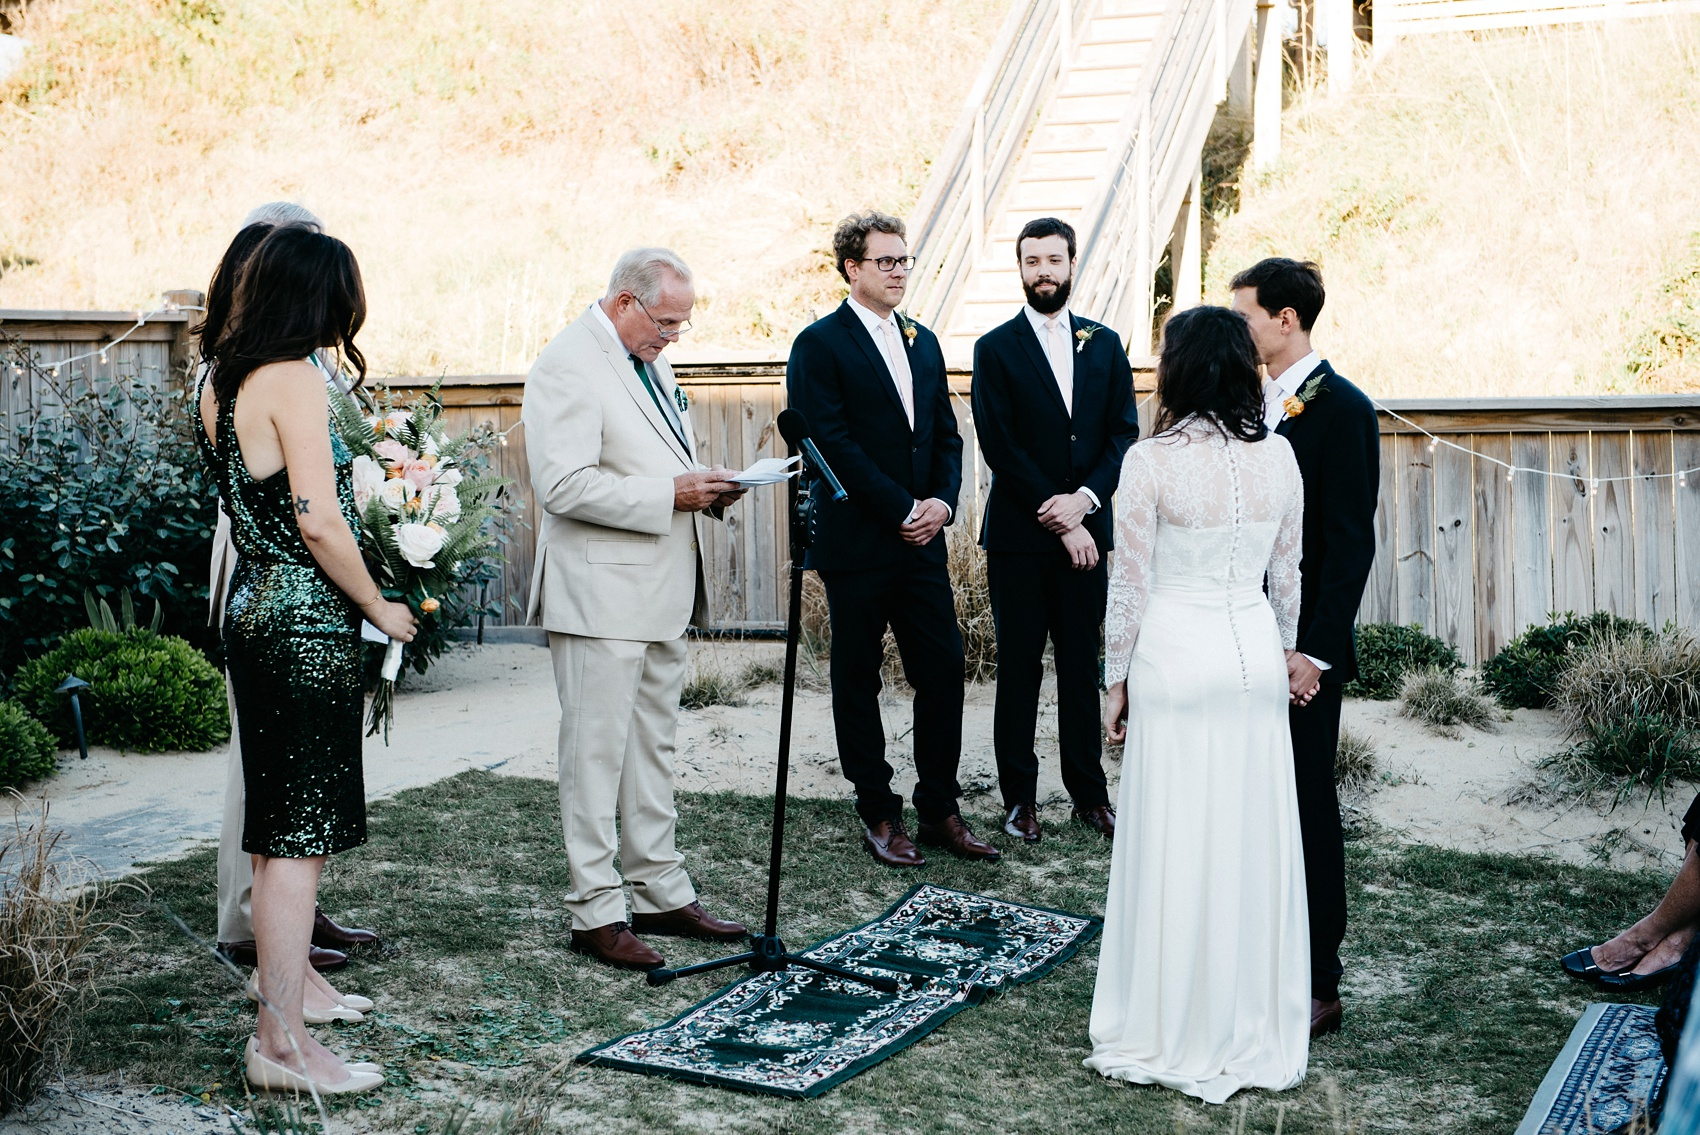 outerbanks_wedding_photographer_1282.jpg